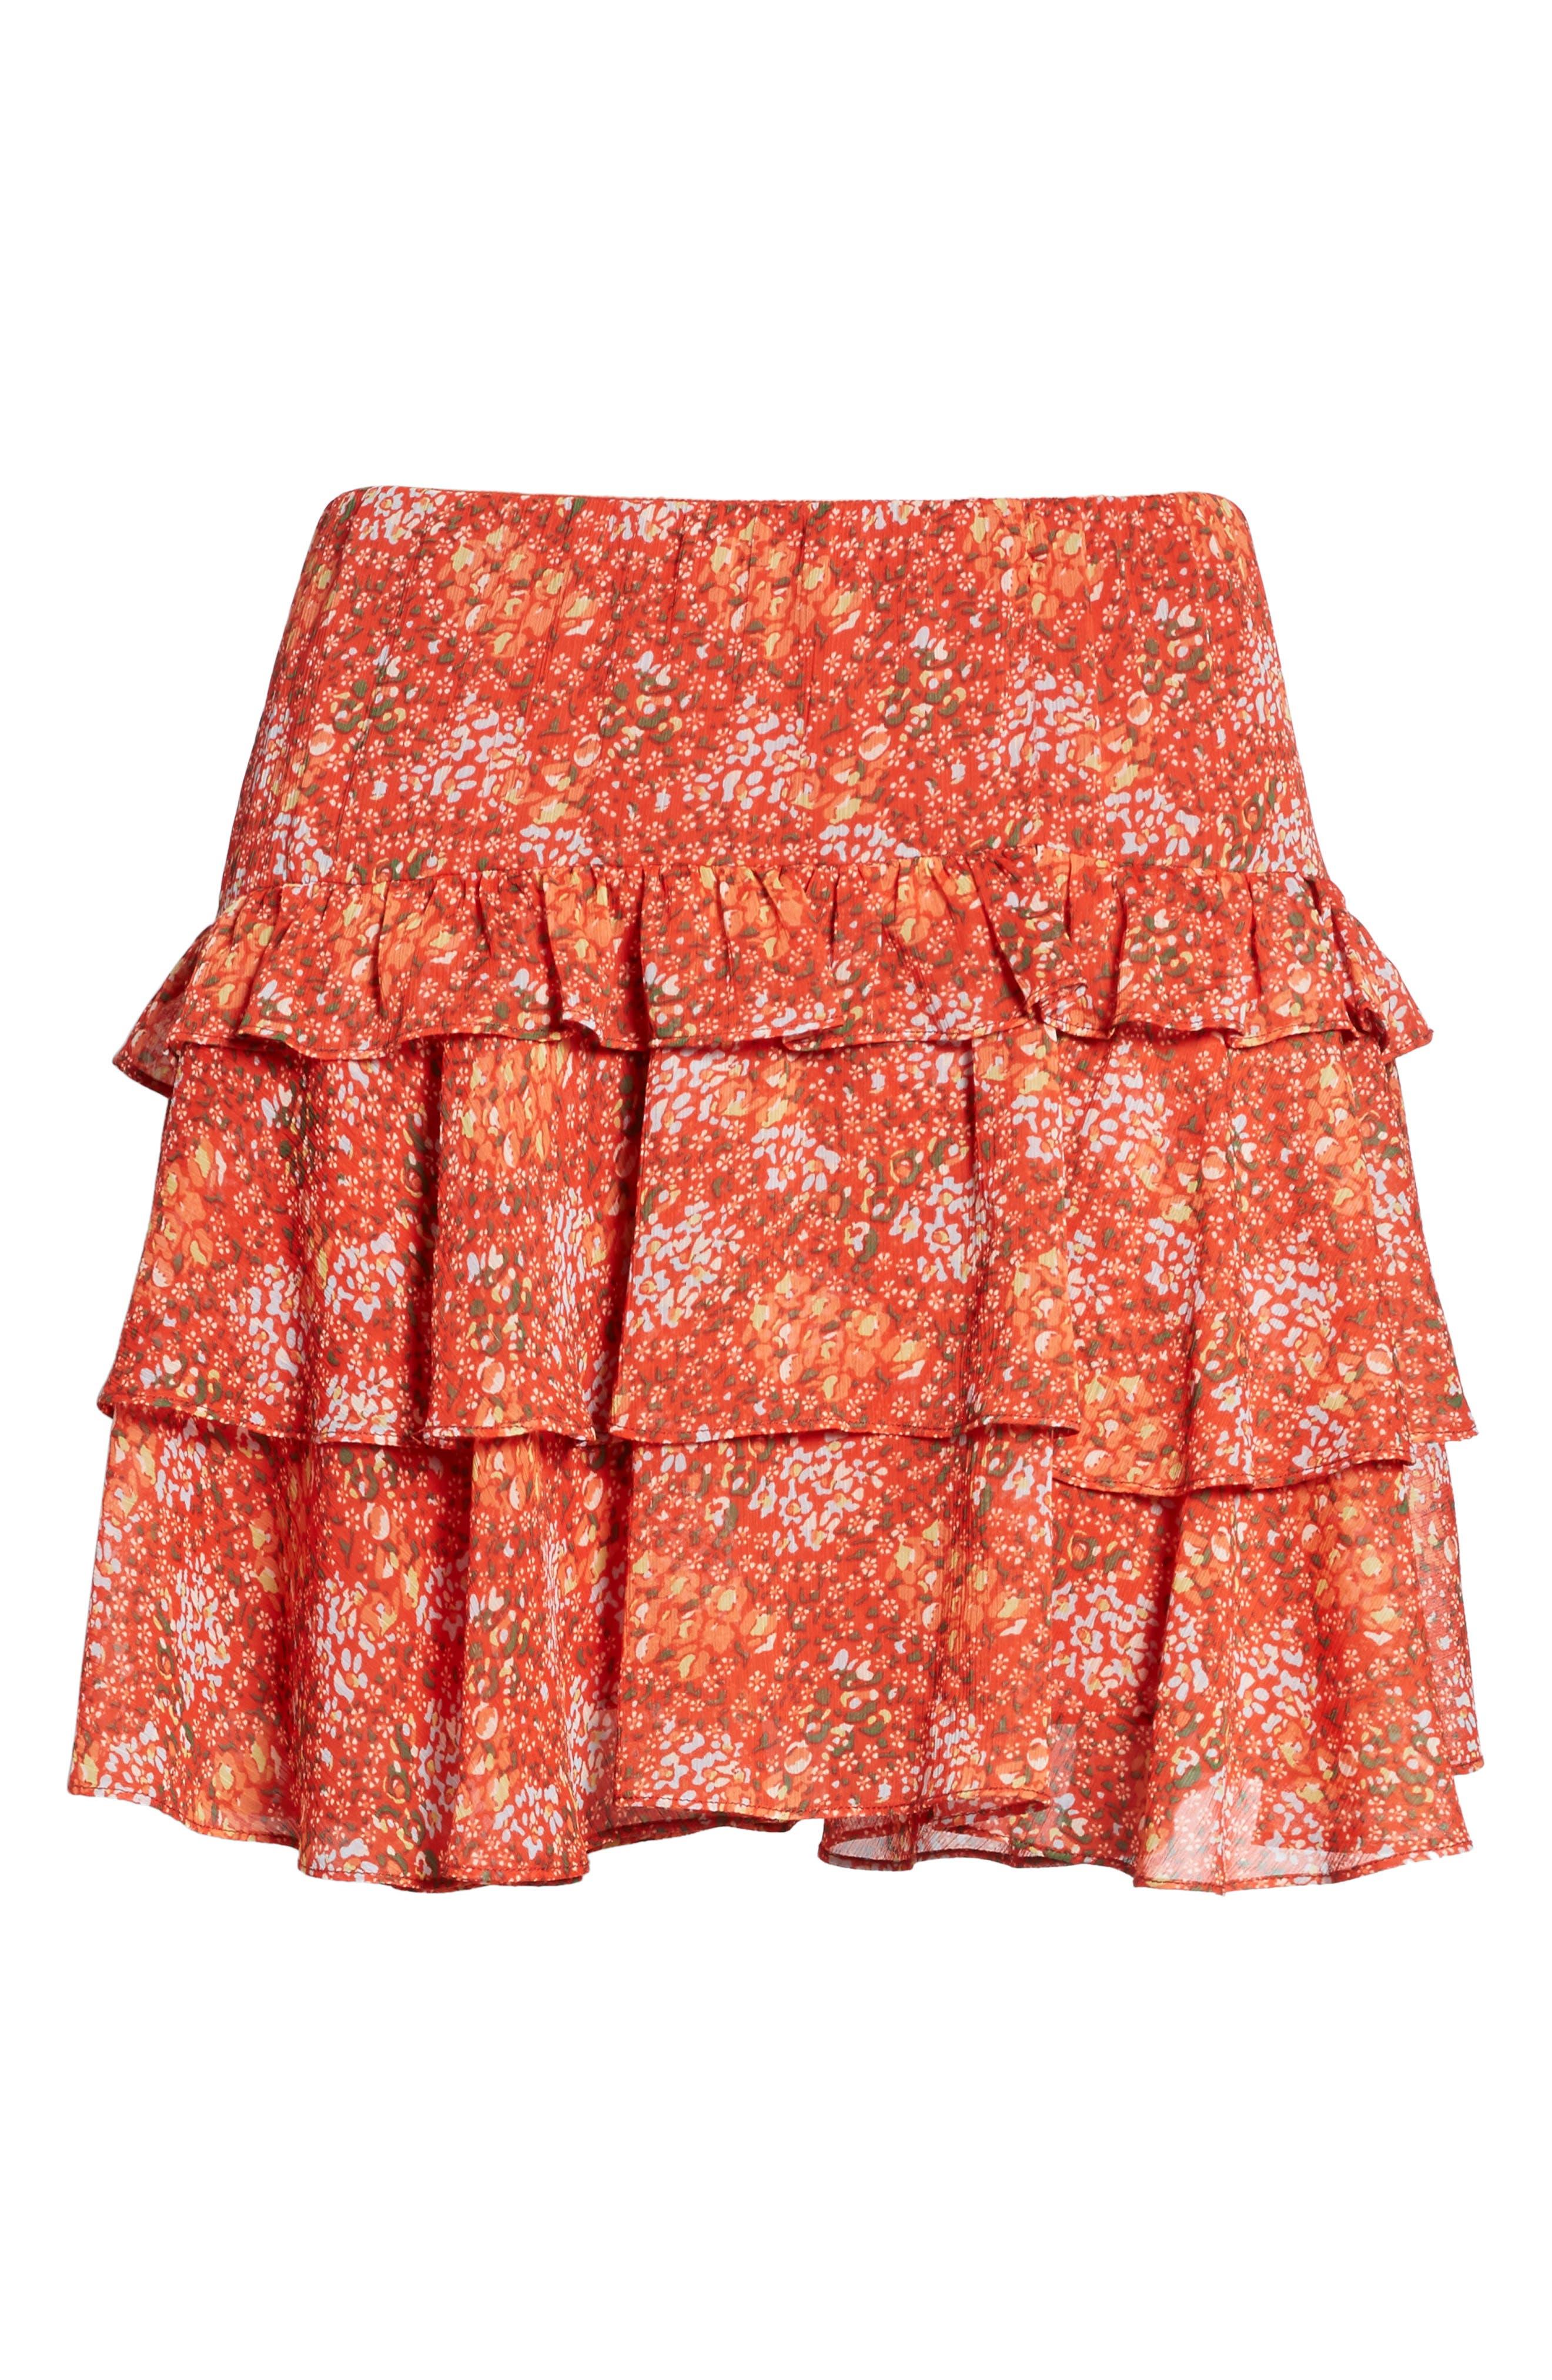 Phoebe Ruffle Tier Skirt,                             Alternate thumbnail 6, color,                             603